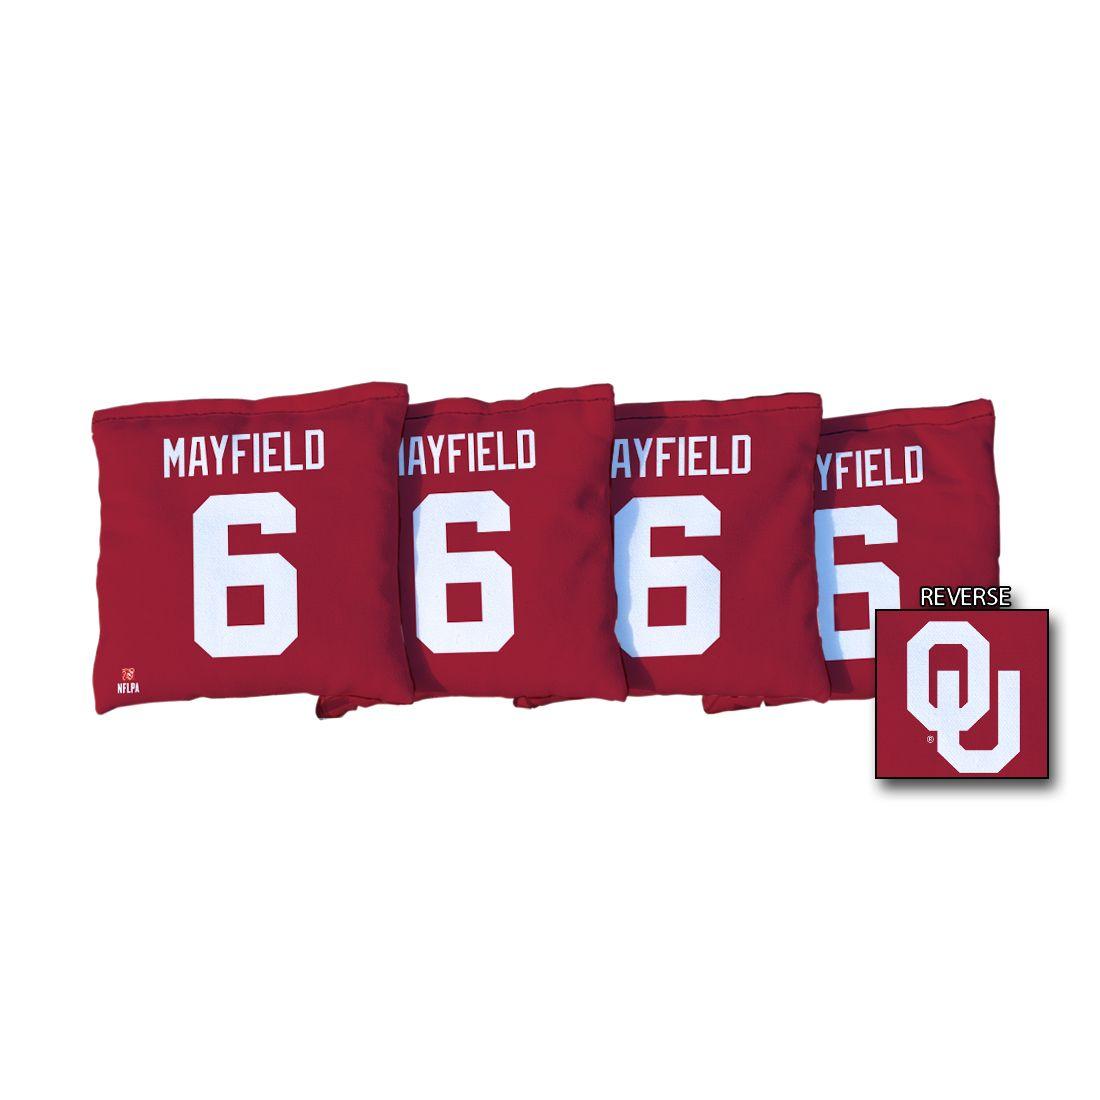 4 University of Oklahoma NFLPA Baker Mayfield Red Regulation Cornhole Bags